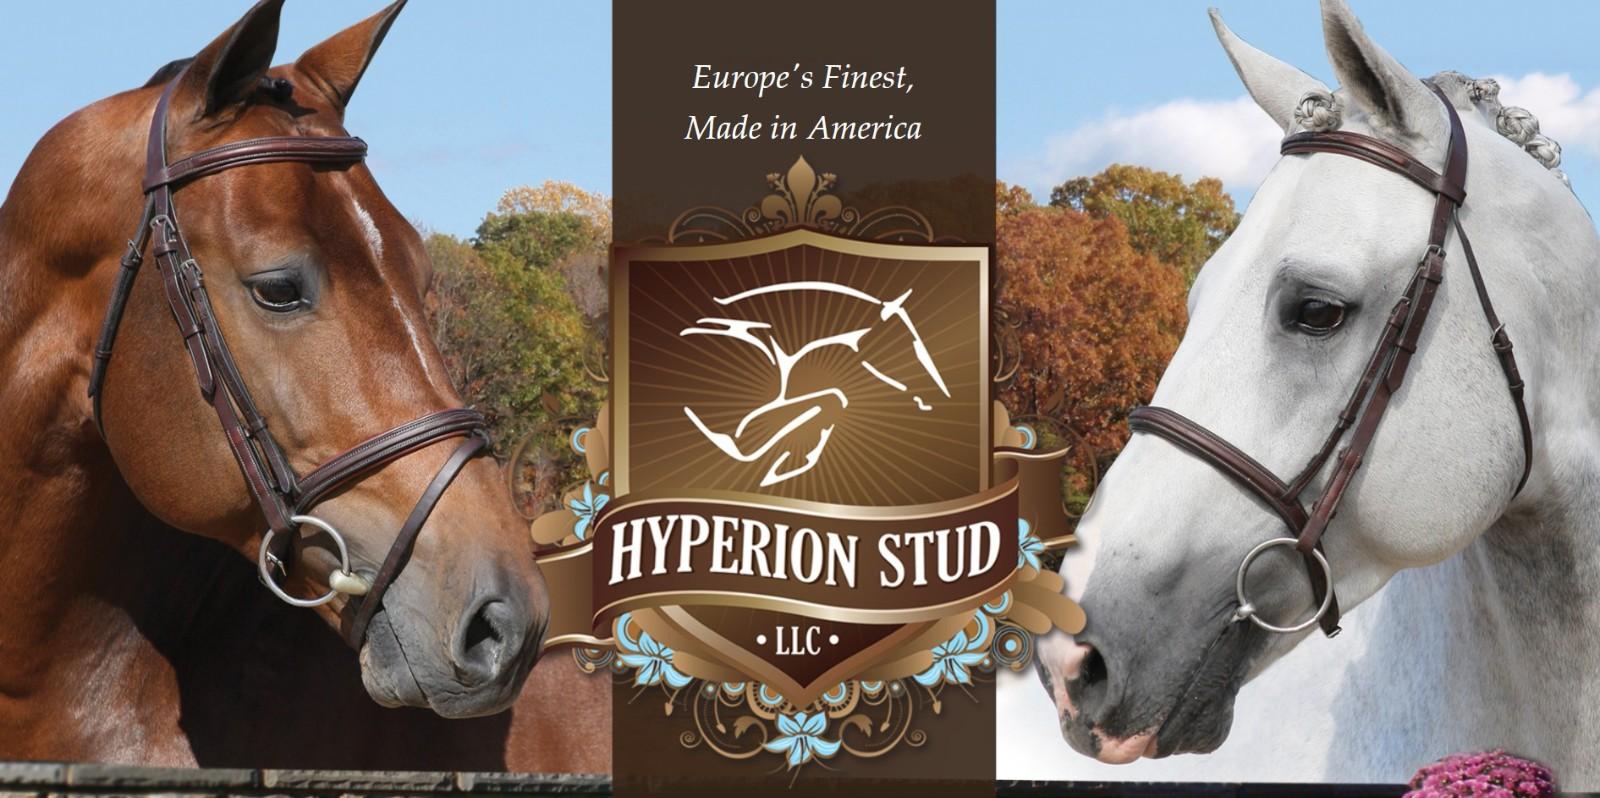 Hyperion stud